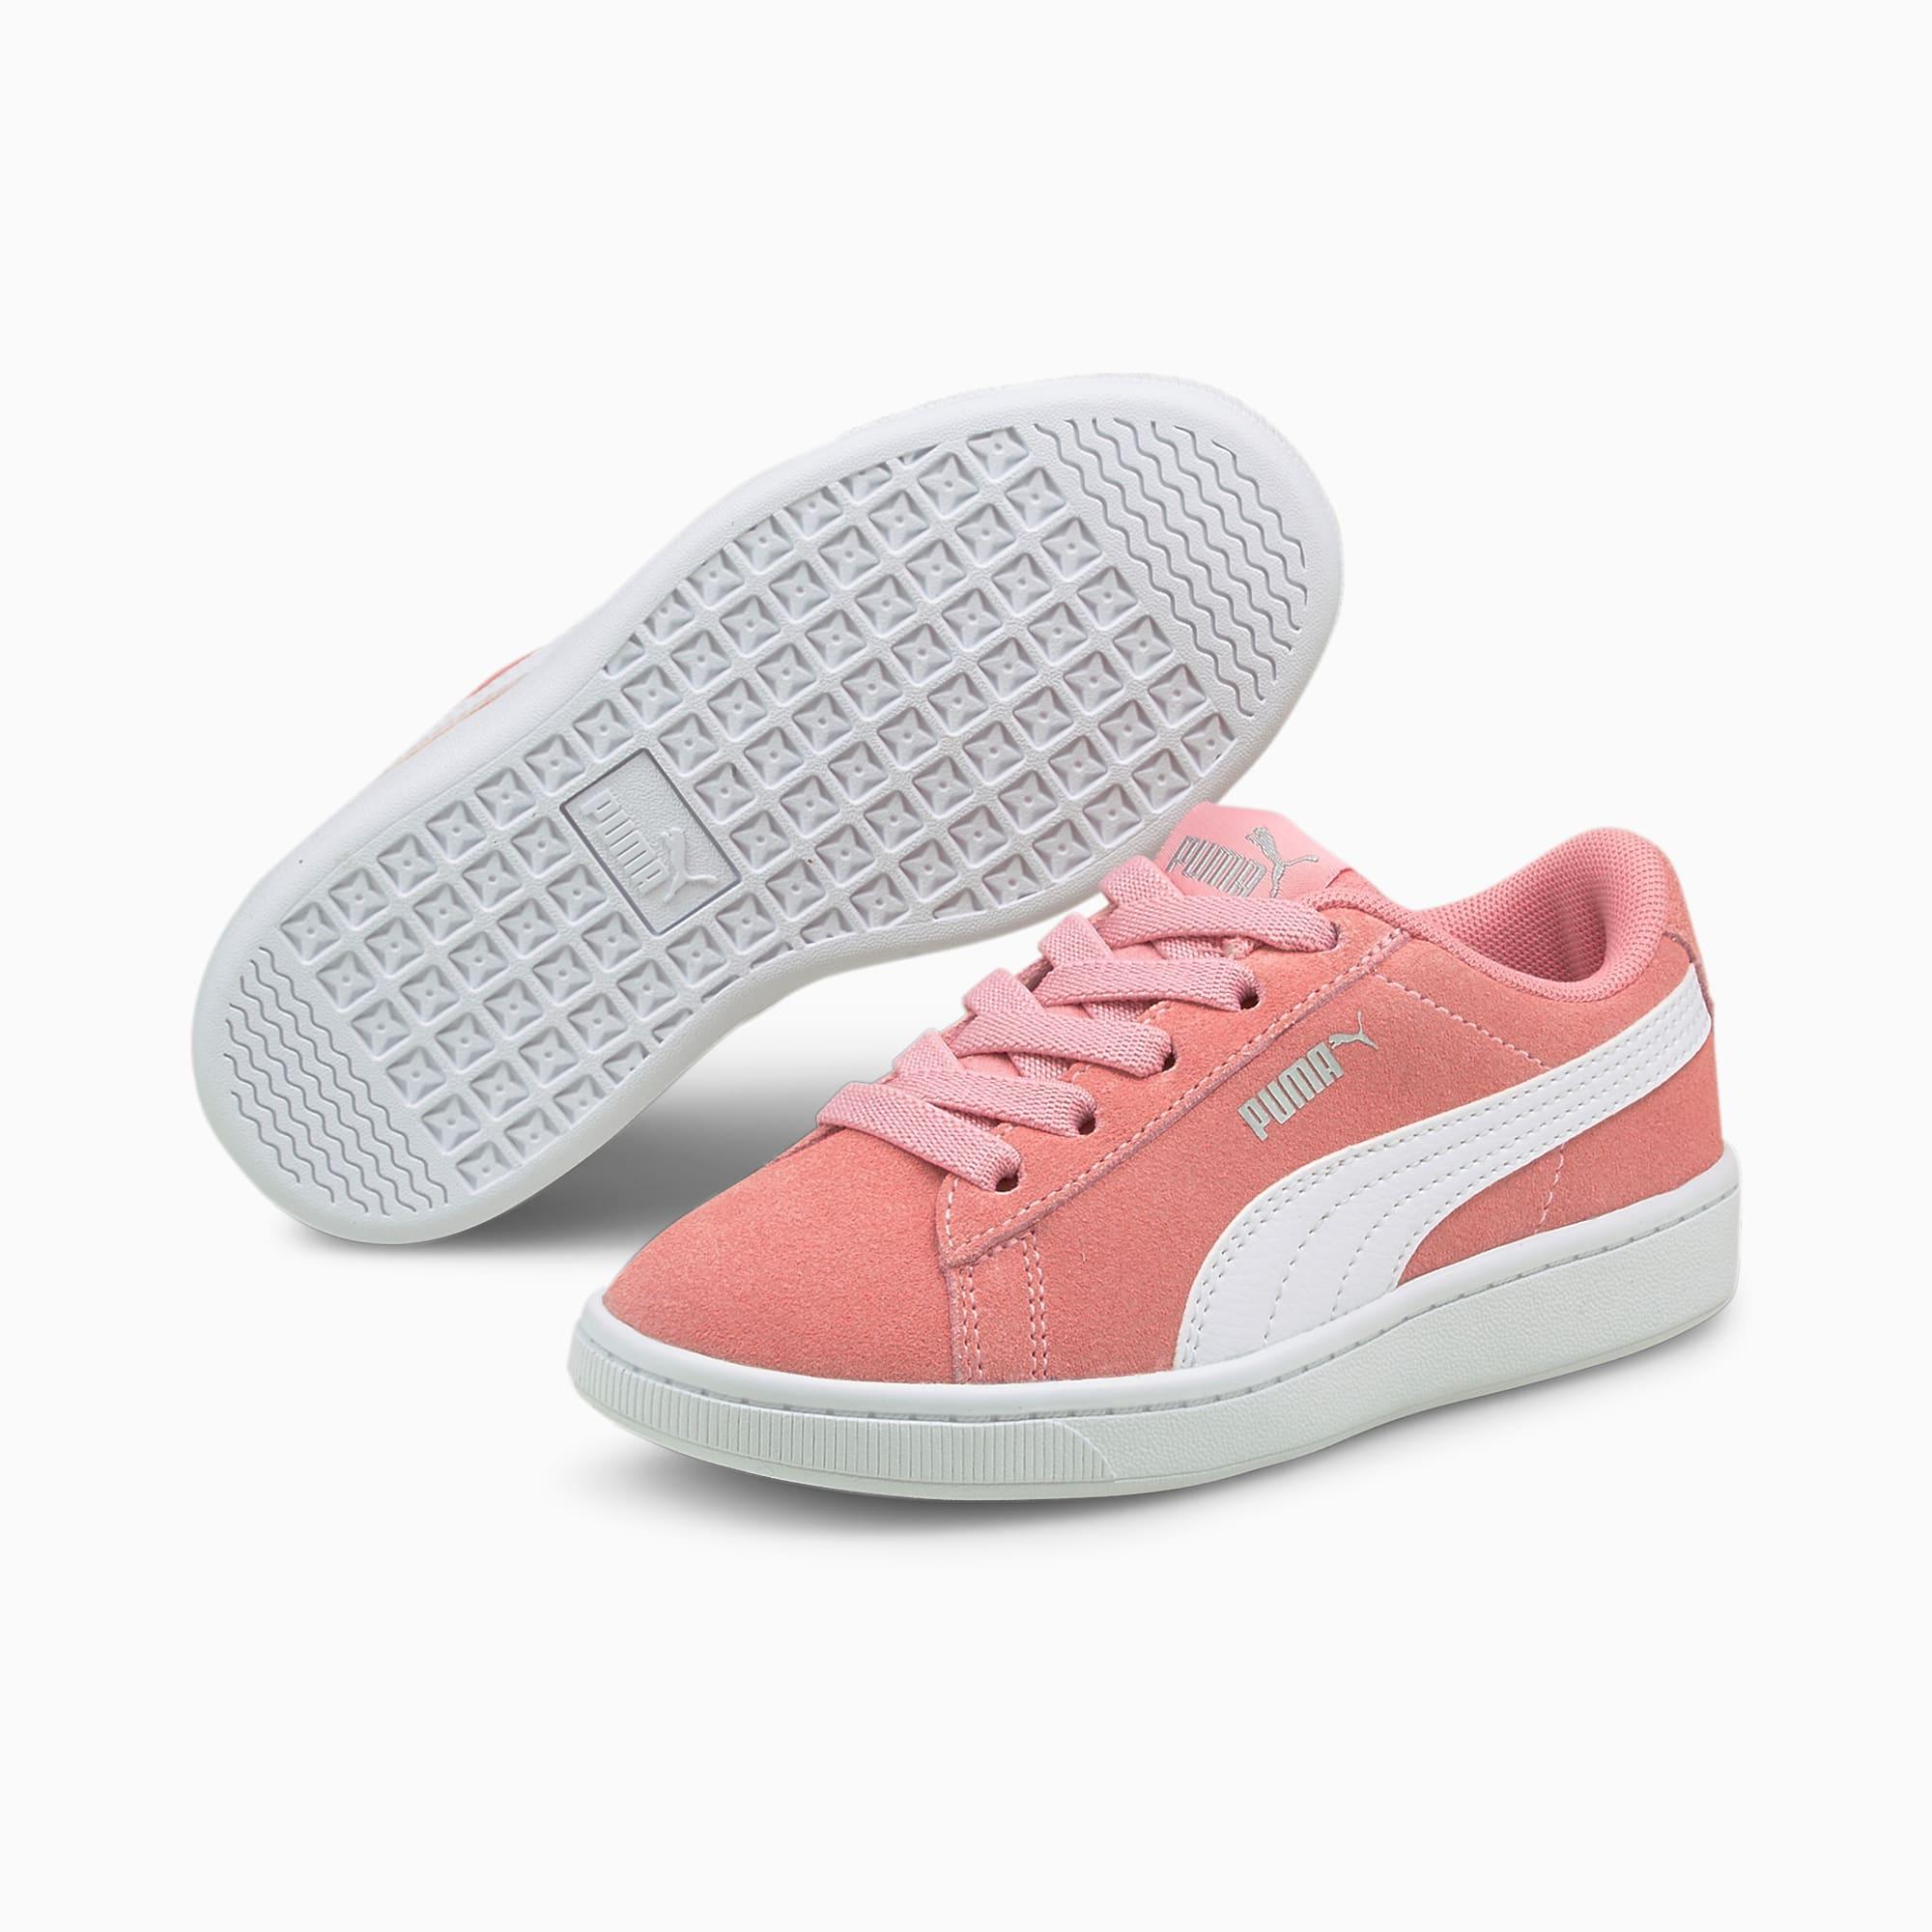 PUMA Vikky v2 Suede Little Kids' Shoes   PUMA US